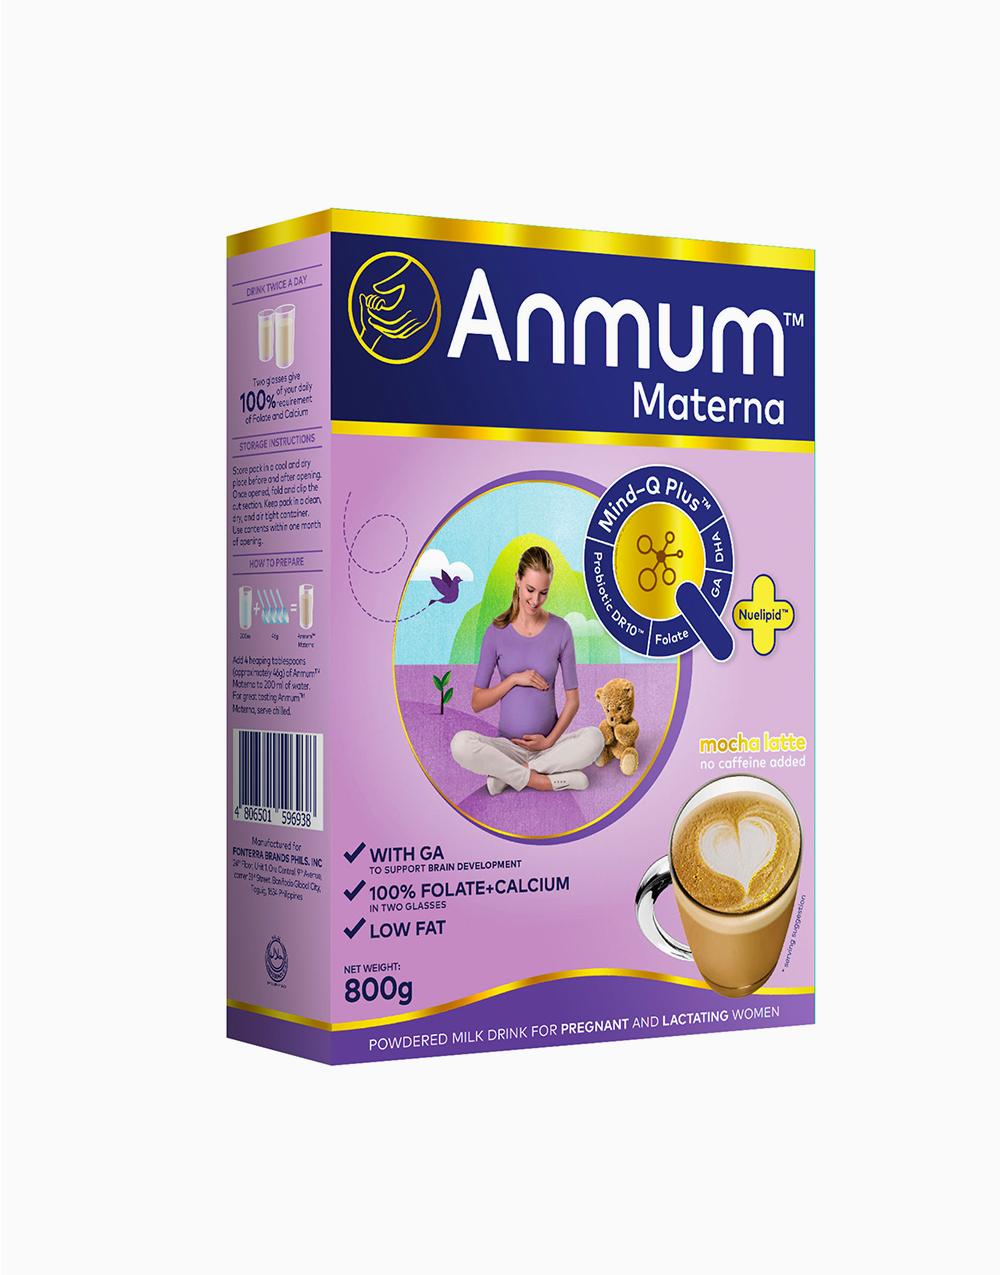 Anmum Materna Mocha Latte (800g) by Anmum